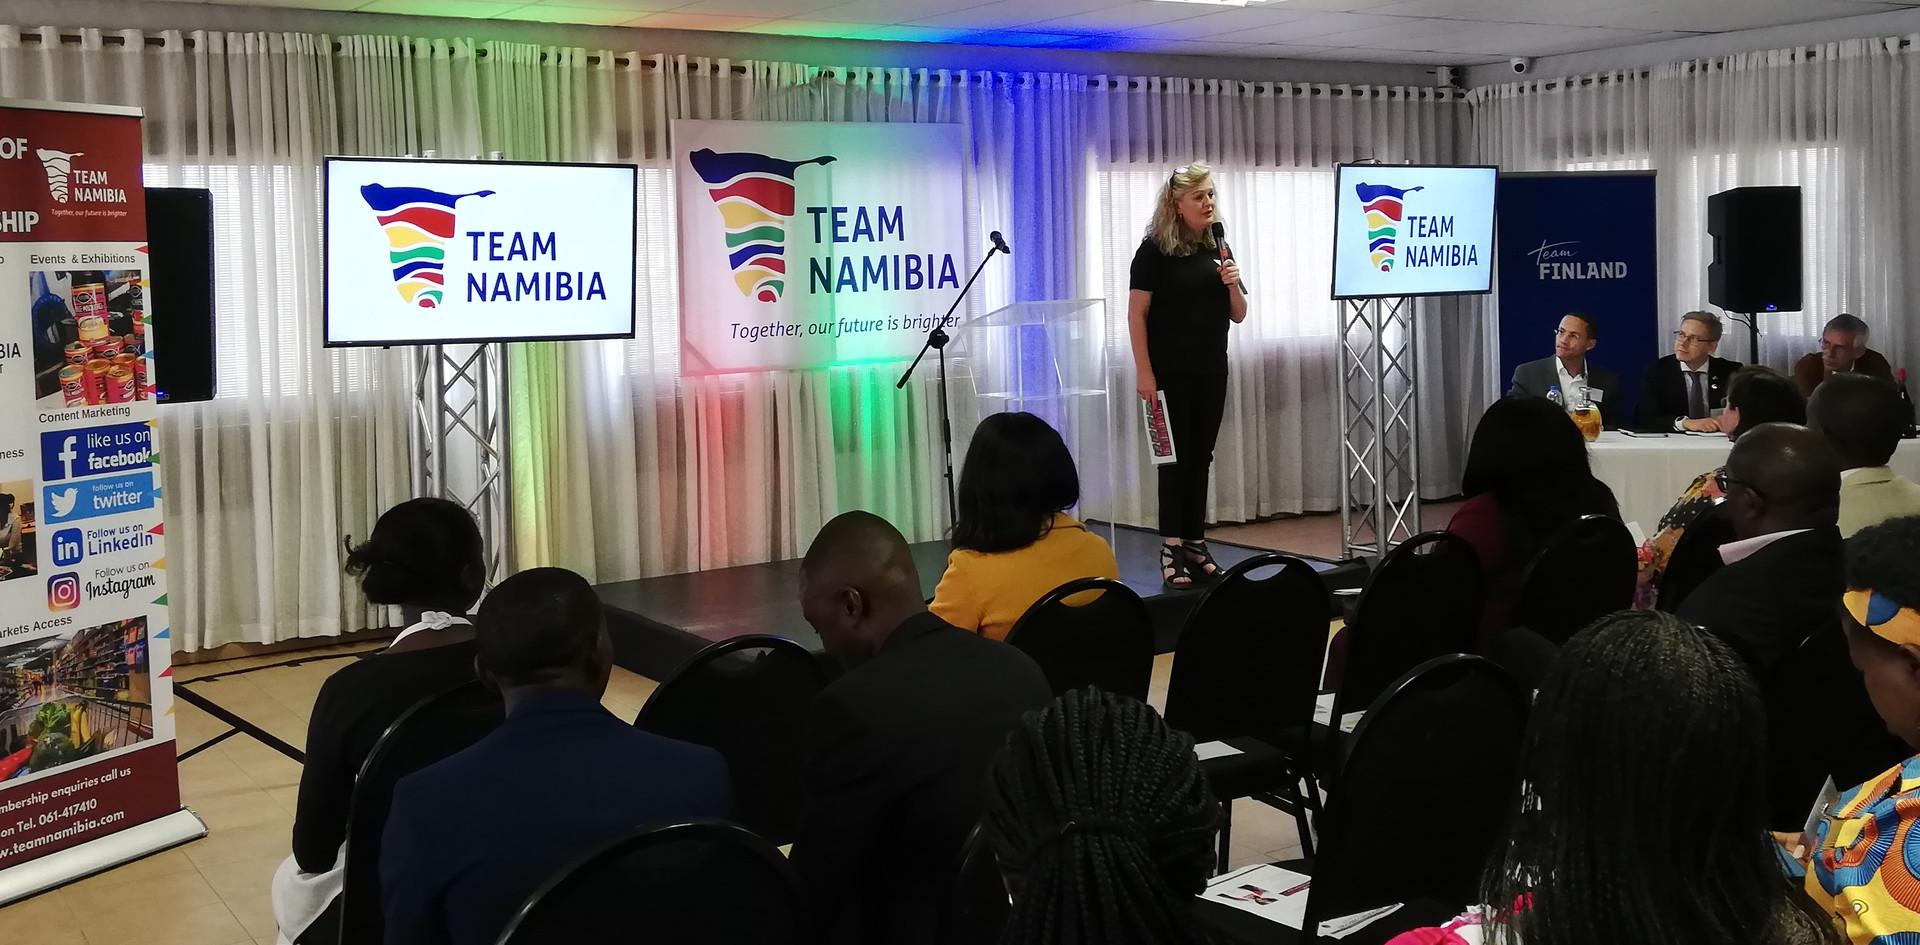 Team Namibia Lion's Den Event 2019